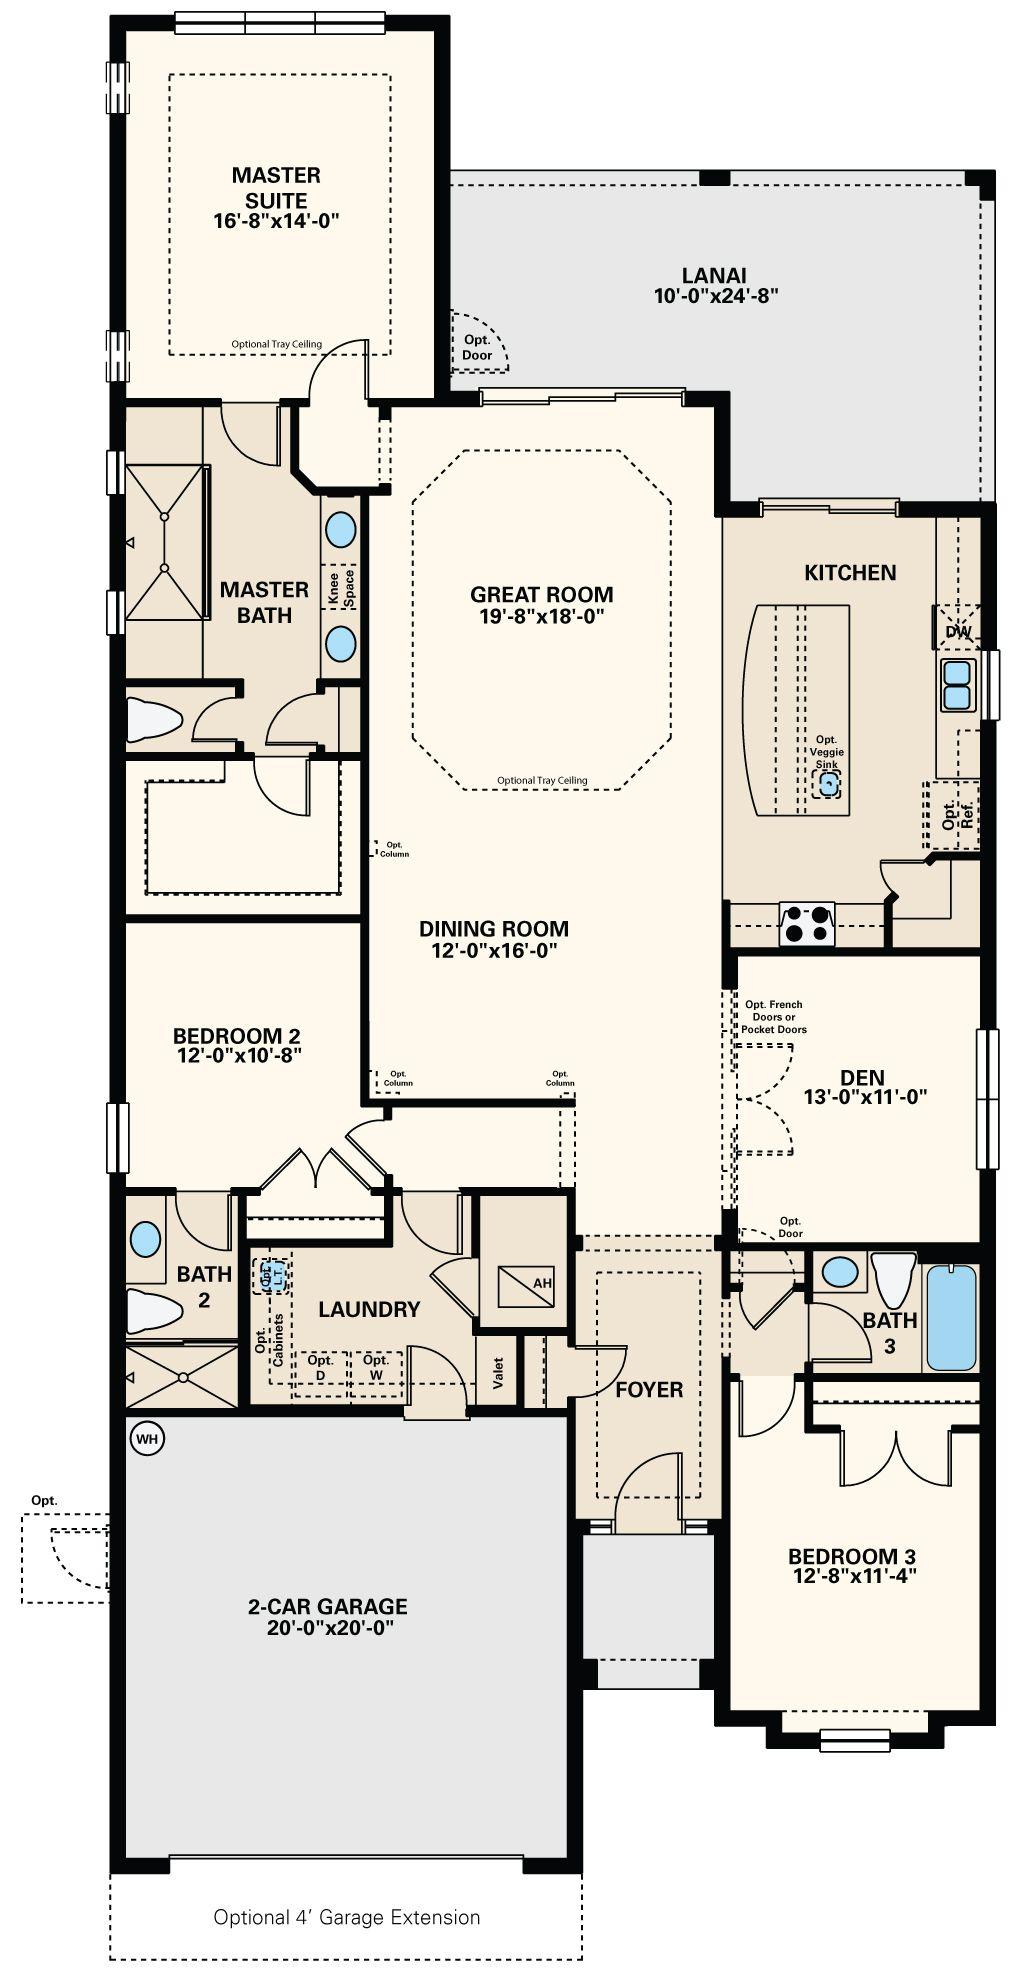 New Homes By Taylor Morrison House Floor Plans Best House Plans Apartment Floor Plans